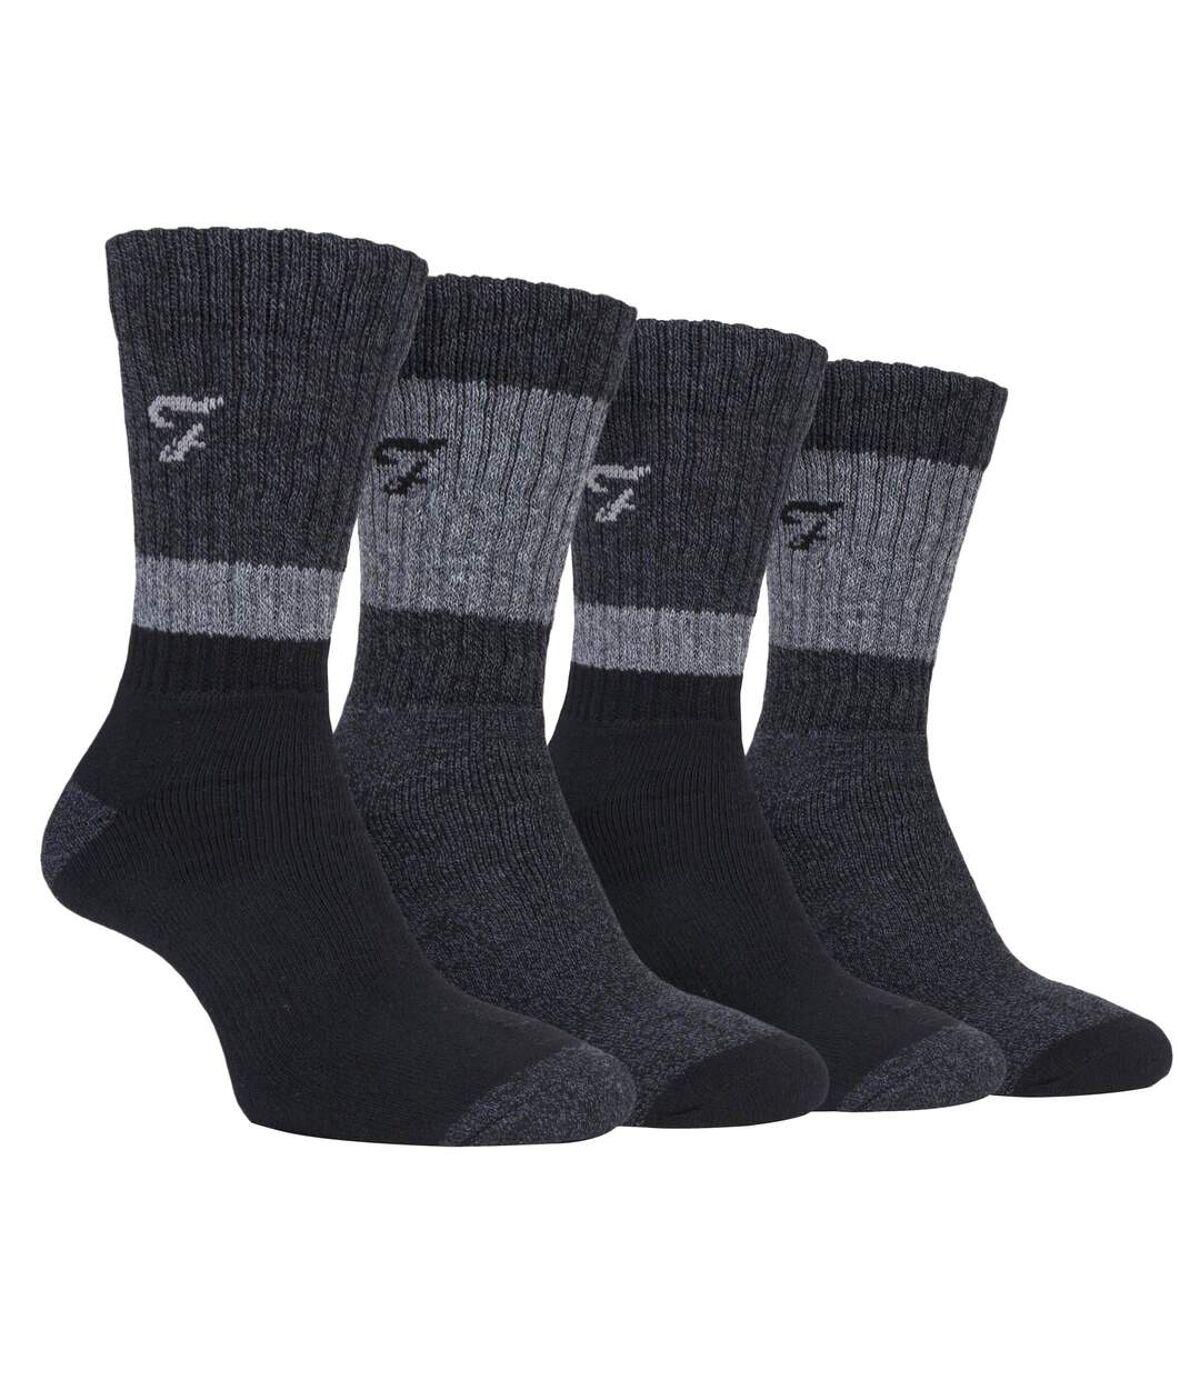 Mens 4 Pk Cotton Cushioned Hiking Boot Socks